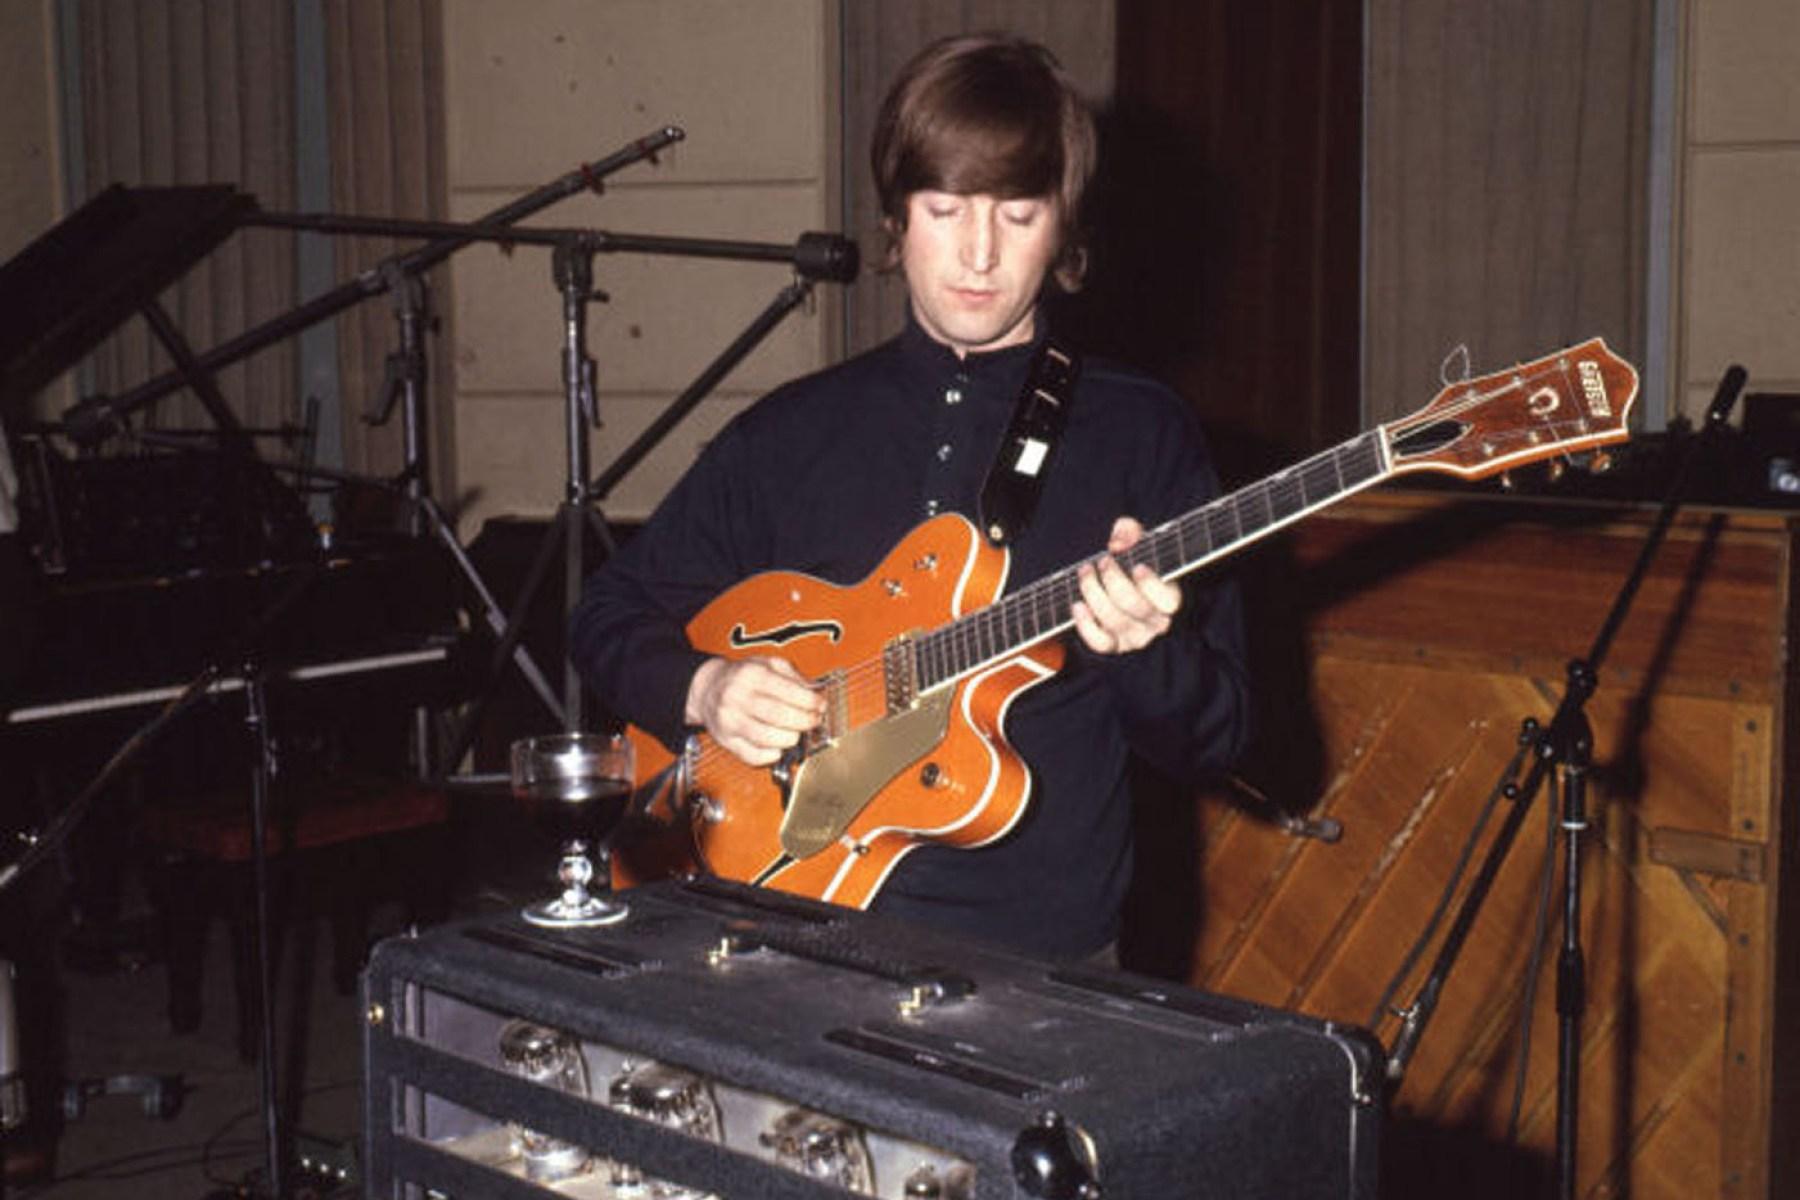 John Lennon S Paperback Writer Guitar Sells For 530k To Colts Owner Rolling Stone